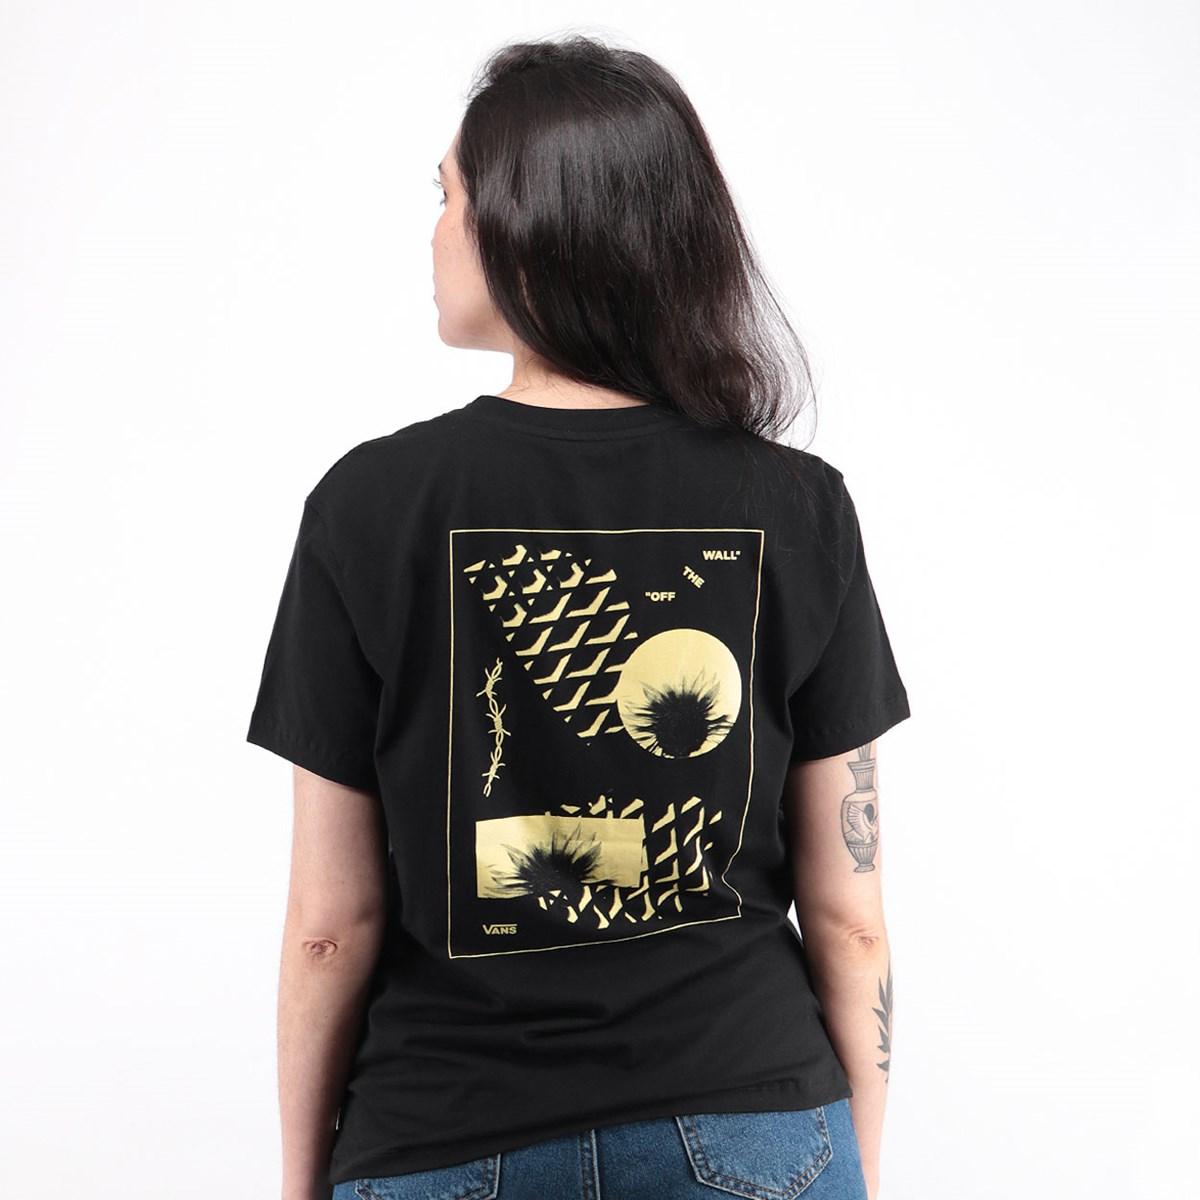 Camiseta Vans Shnarf Black VN0A4SECBLK